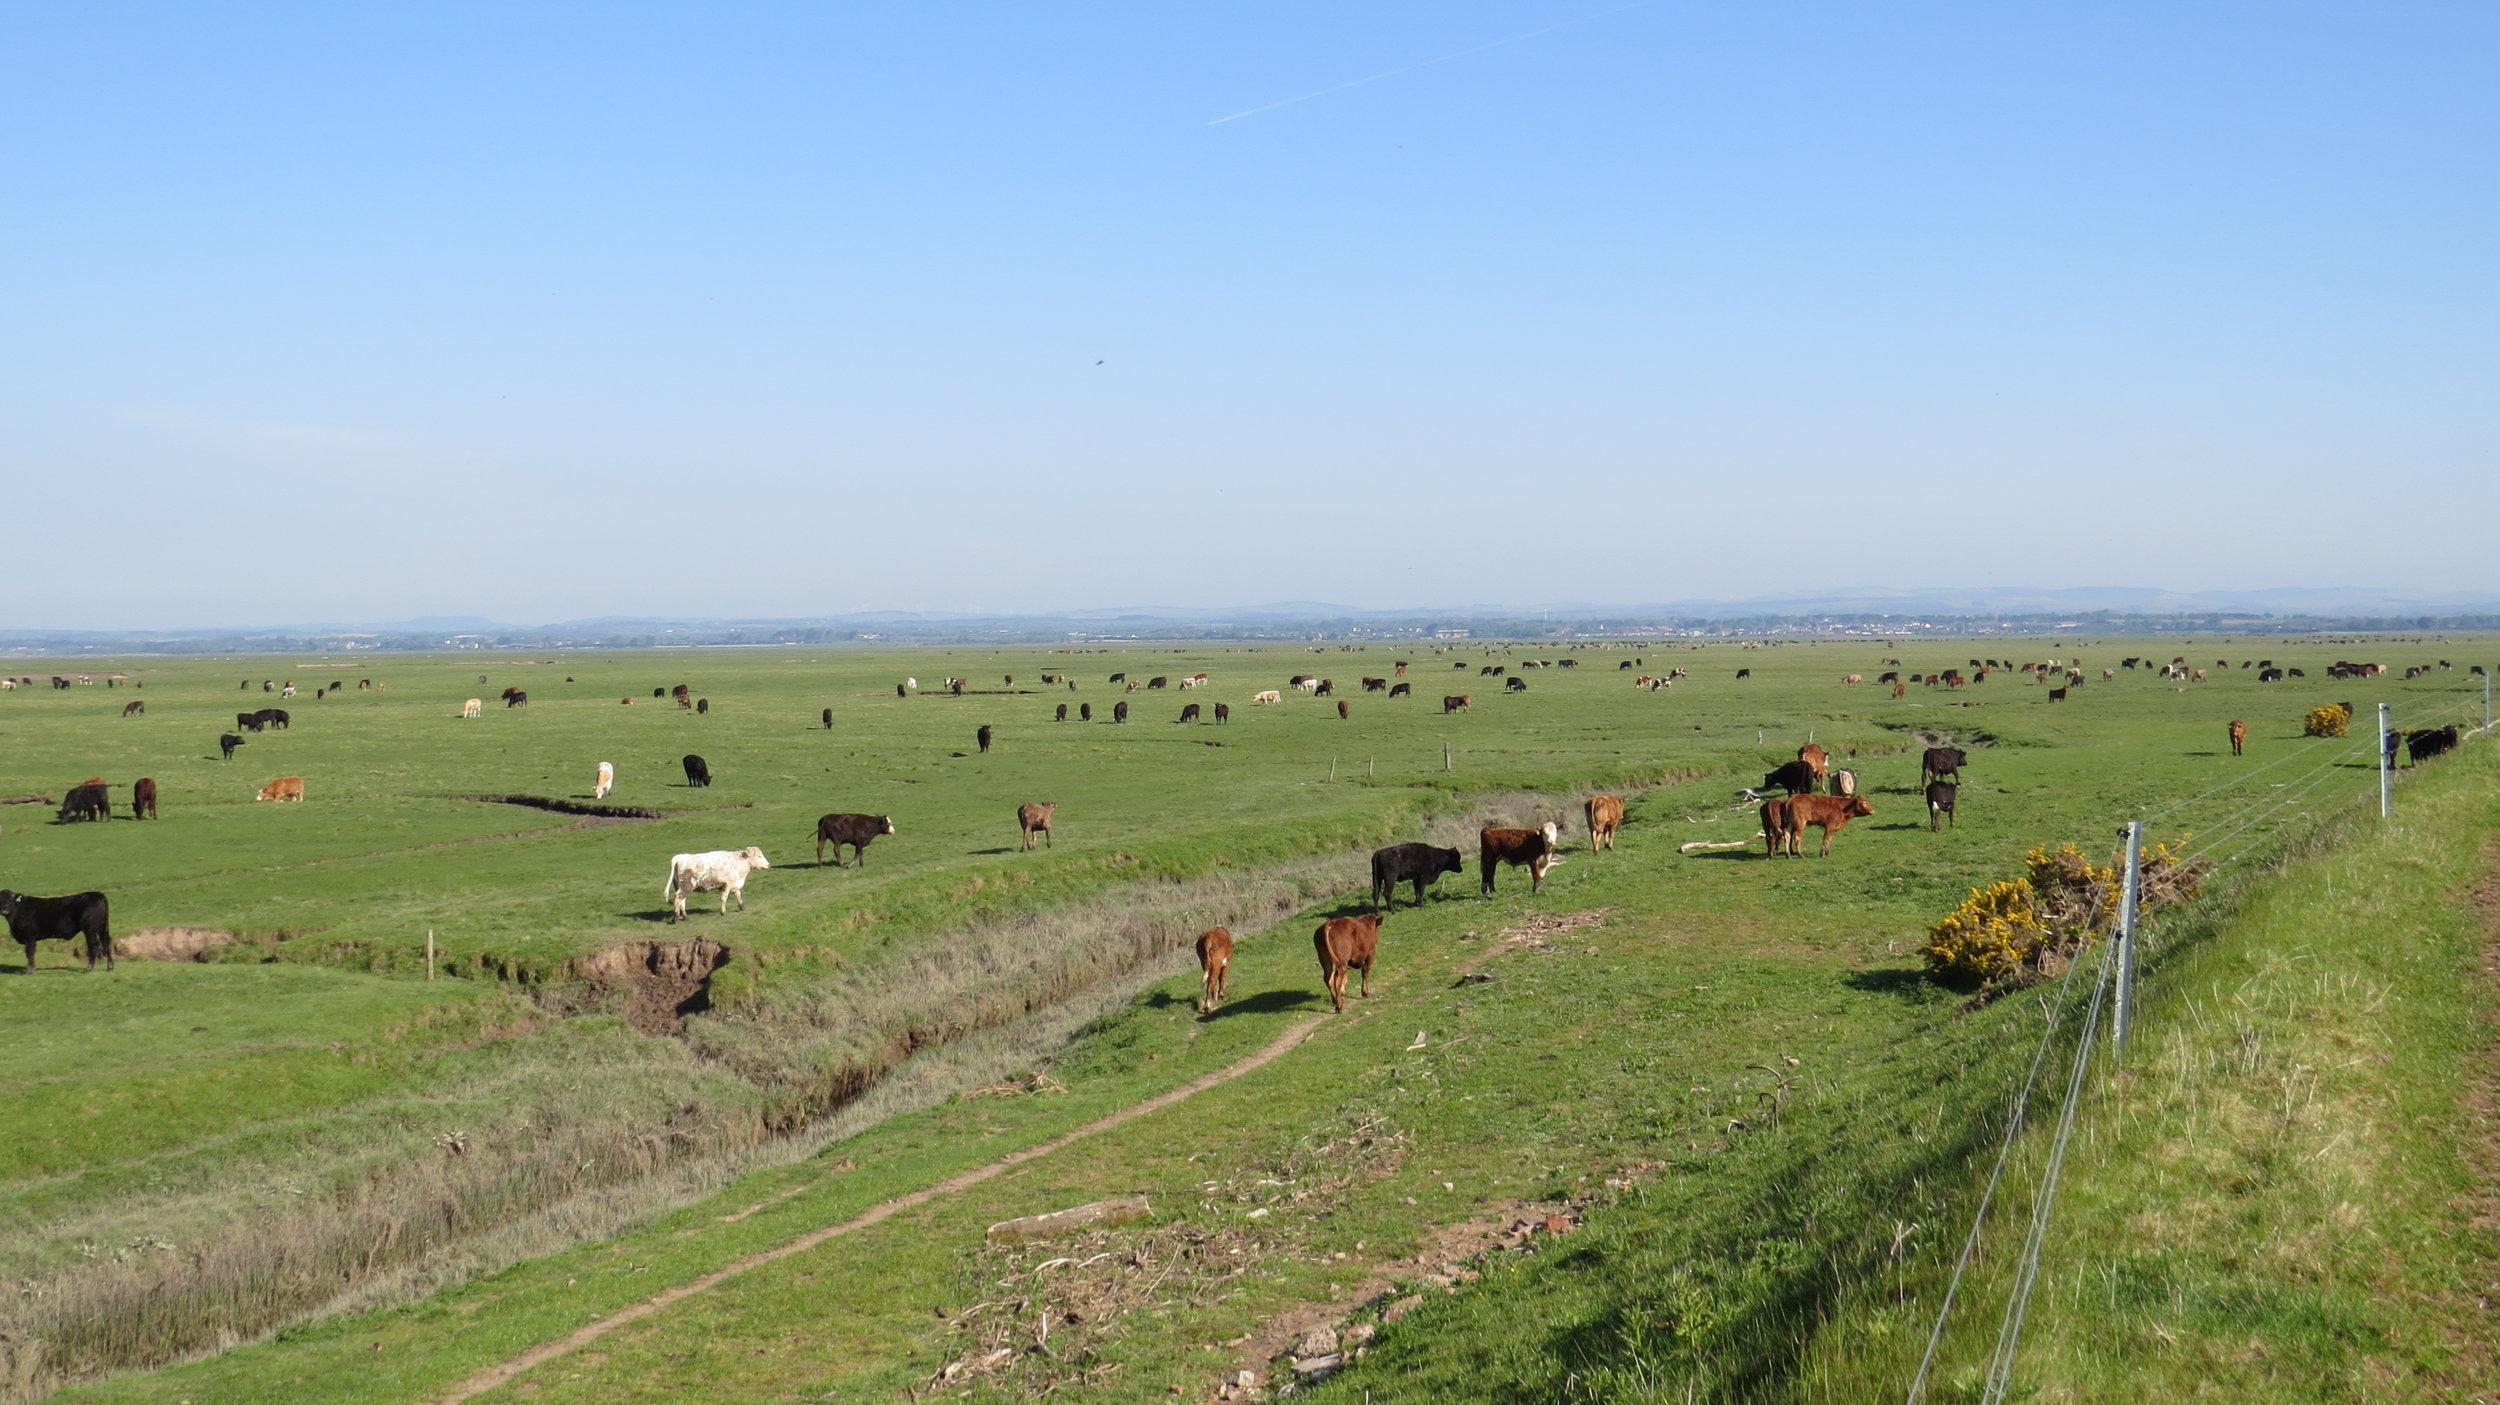 Cattle Everywhere